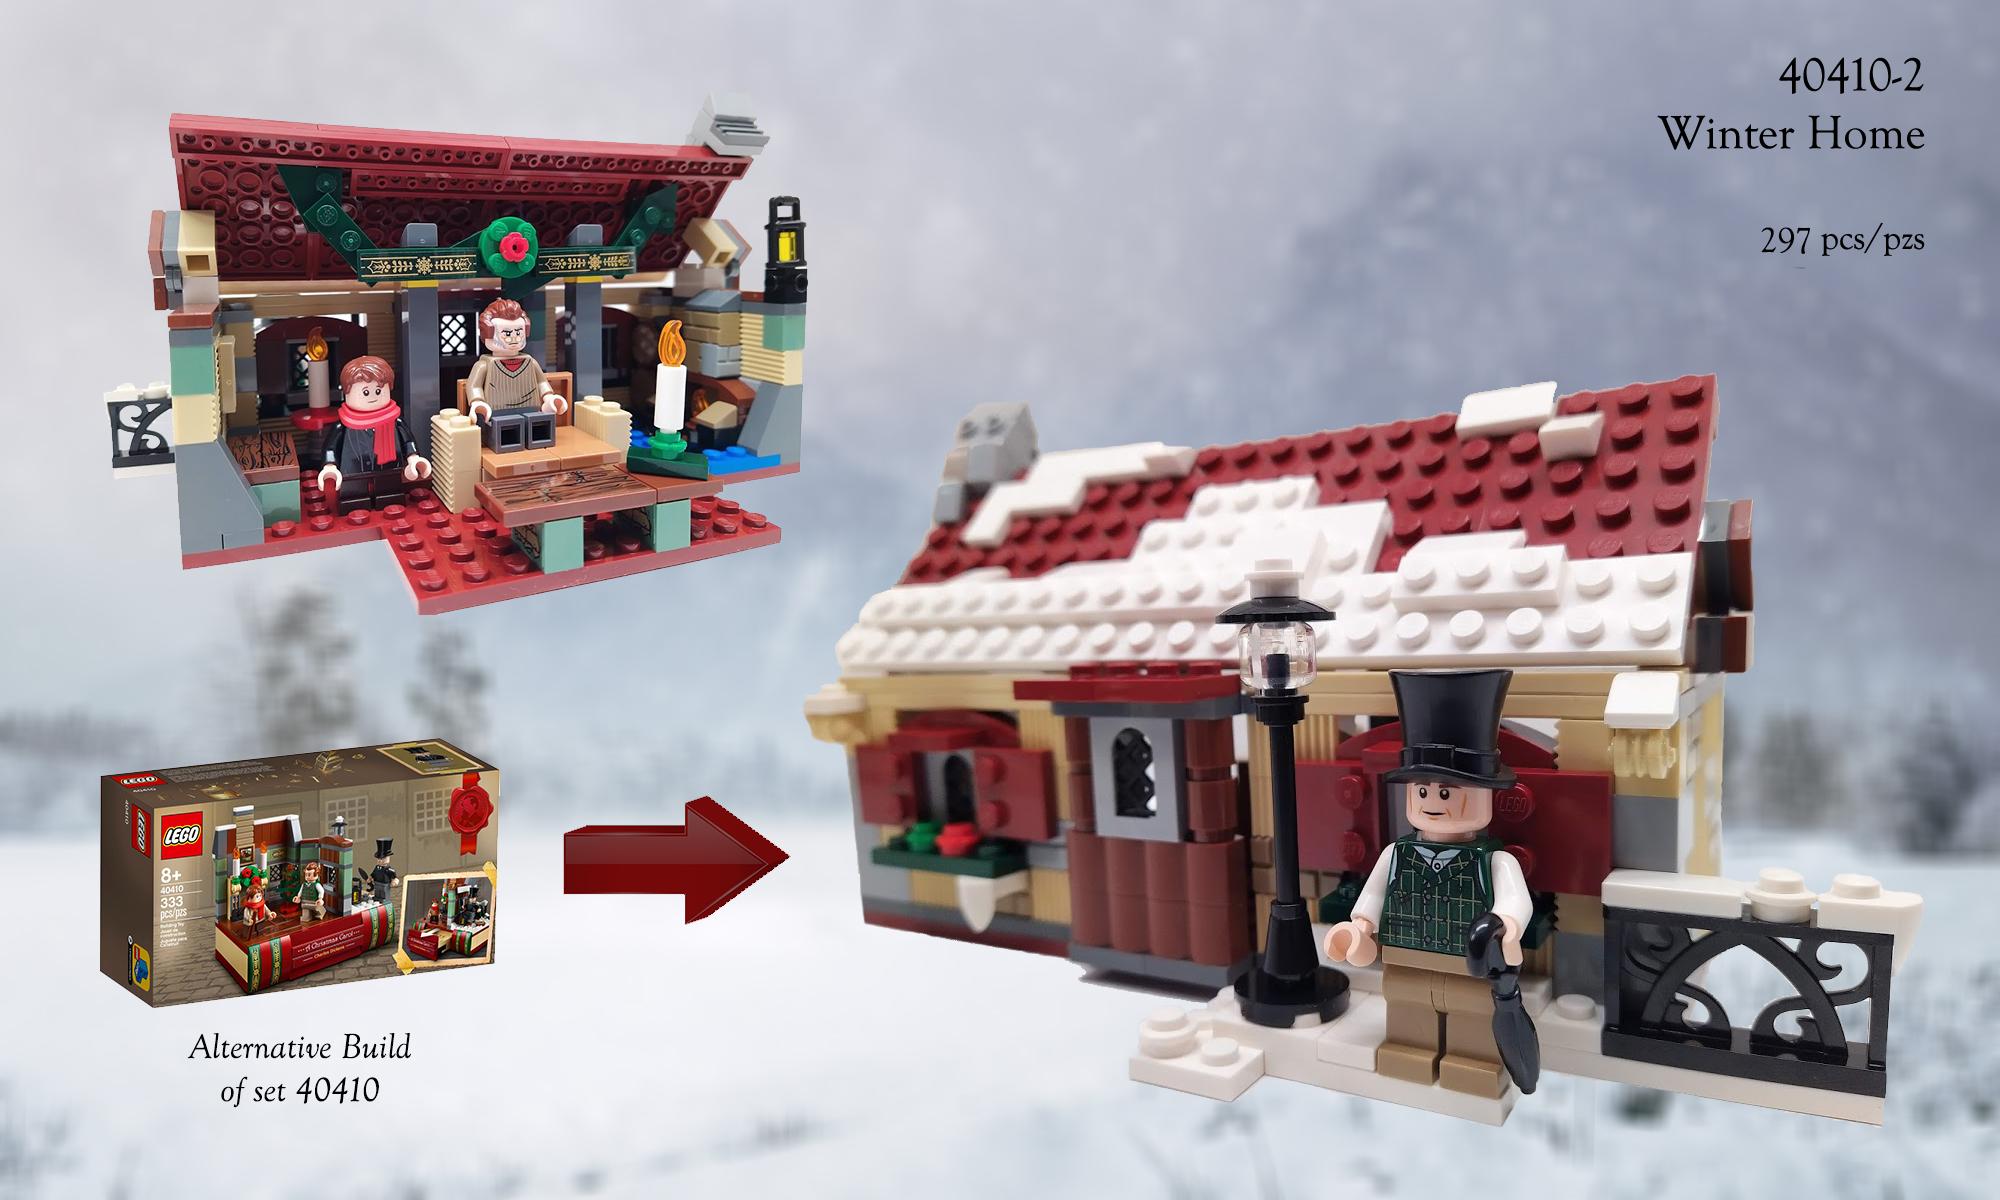 Winter Home 40410-2 Header